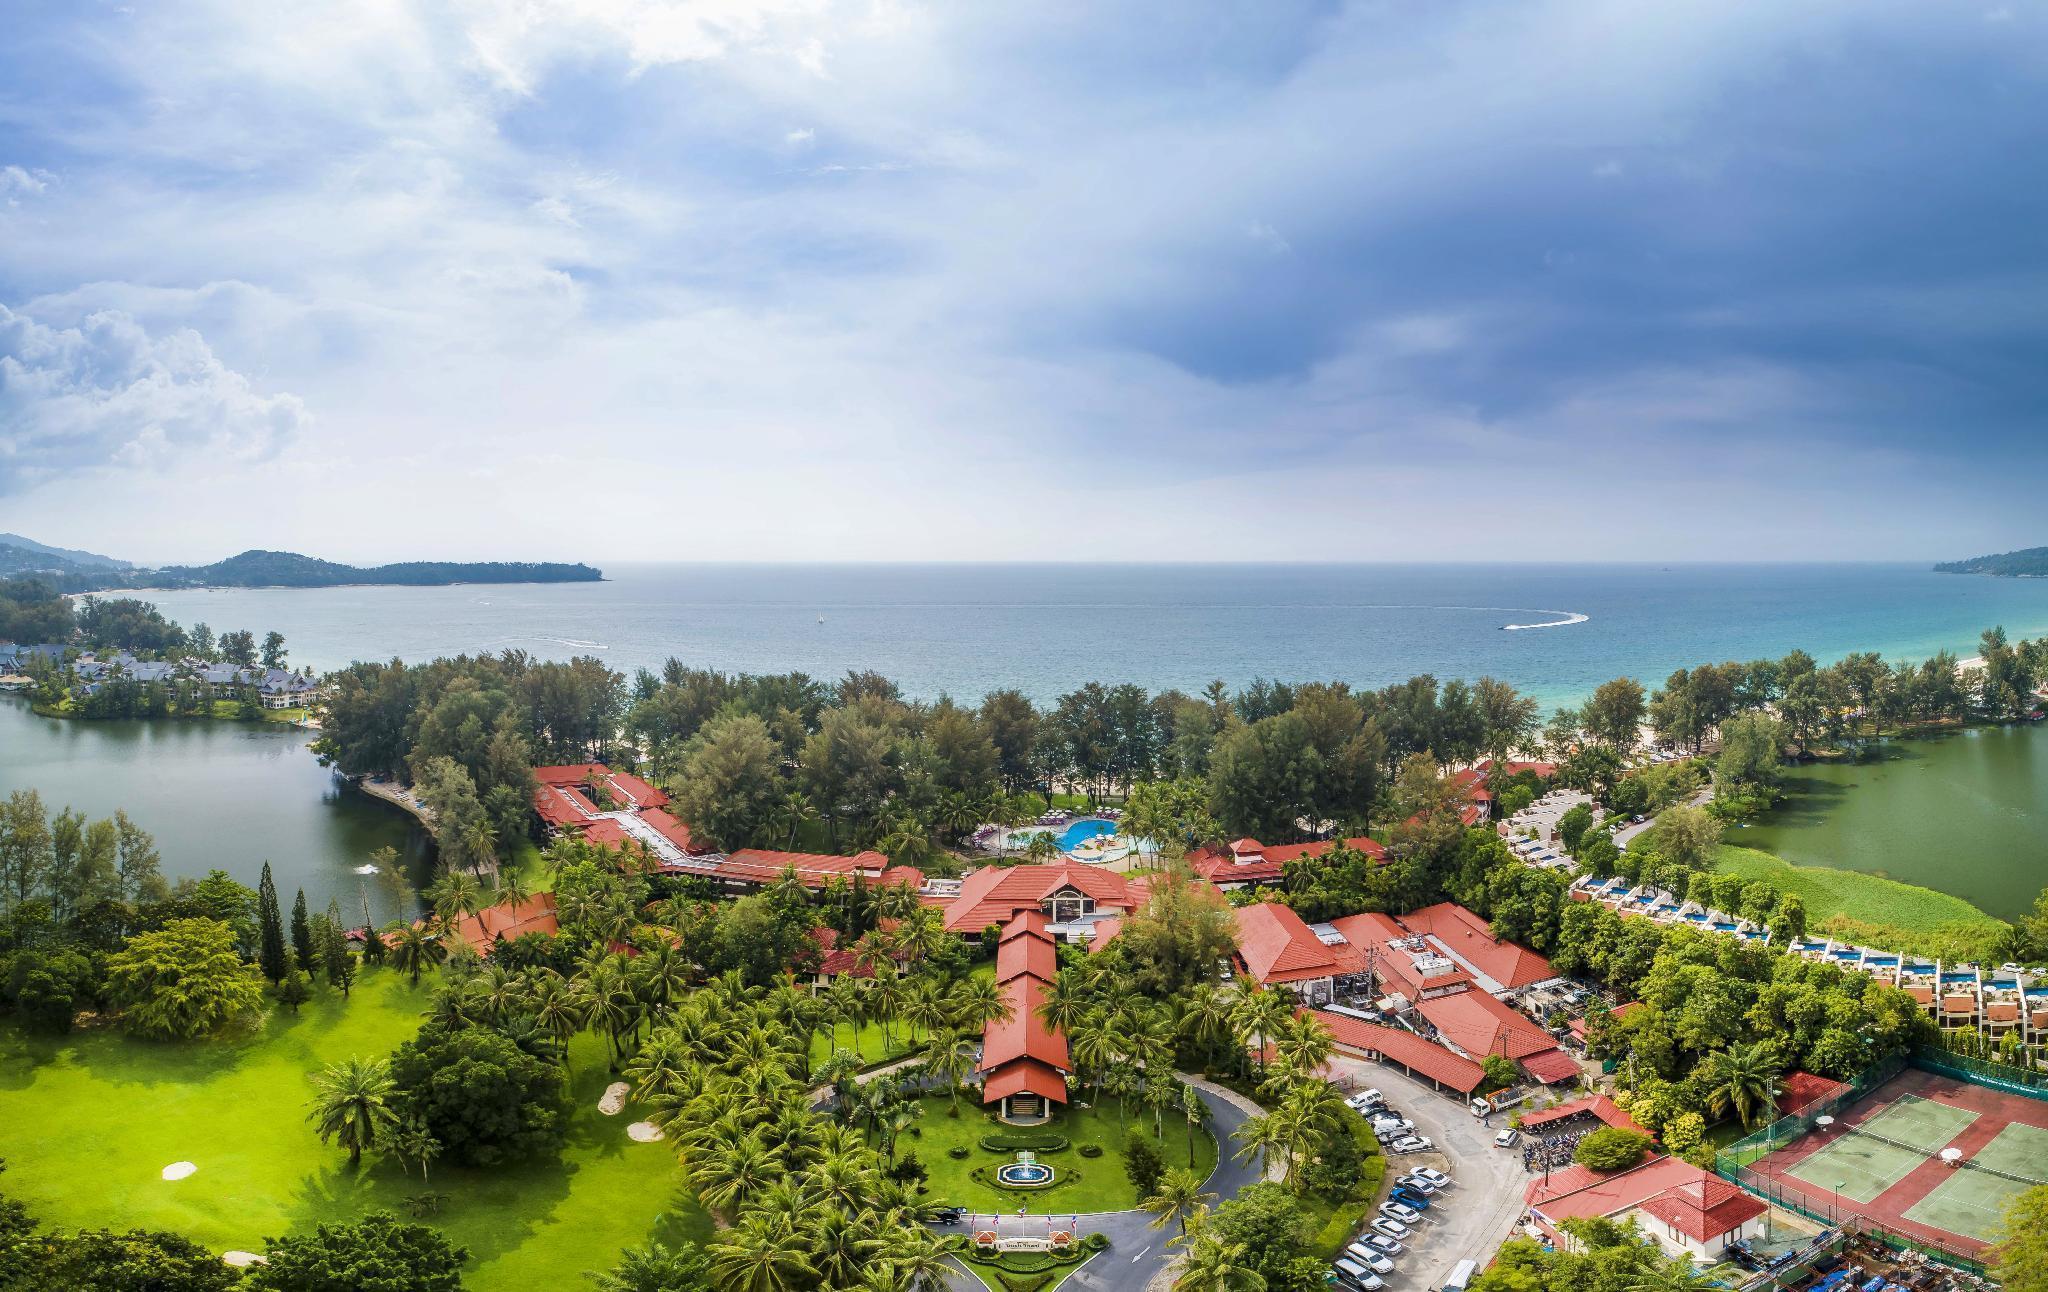 Dusit Thani Laguna Phuket Hotel โรงแรมดุสิตธานี ลากูนา ภูเก็ต